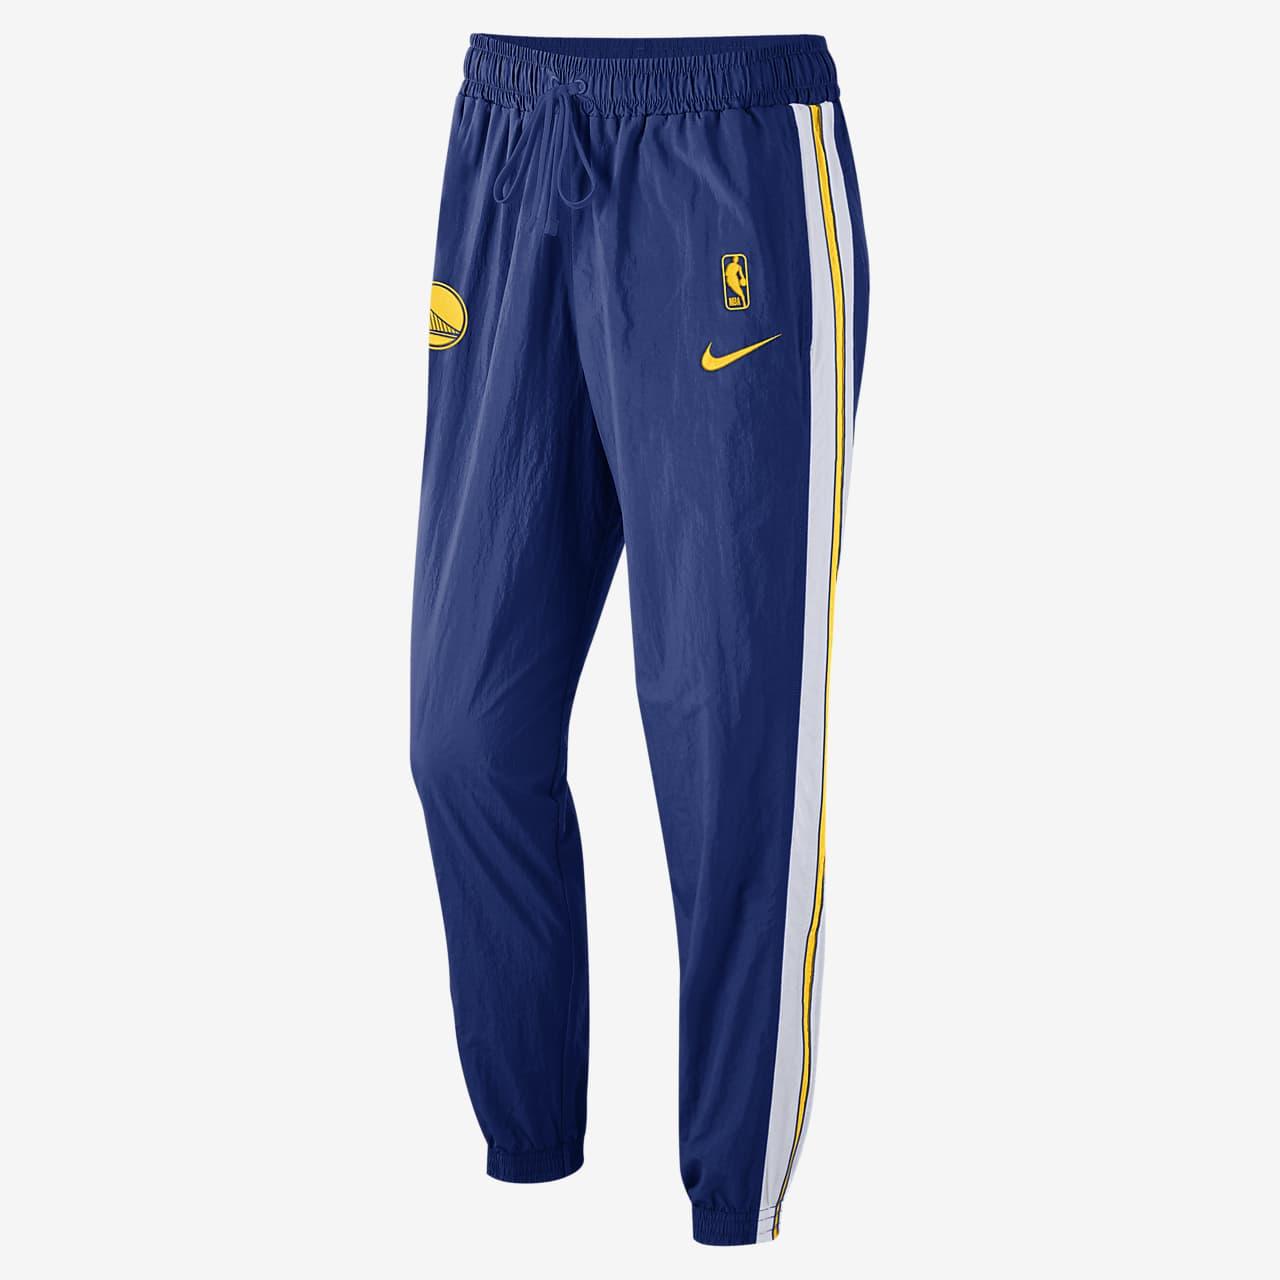 Golden State Warriors Nike Men's NBA Tracksuit Pants